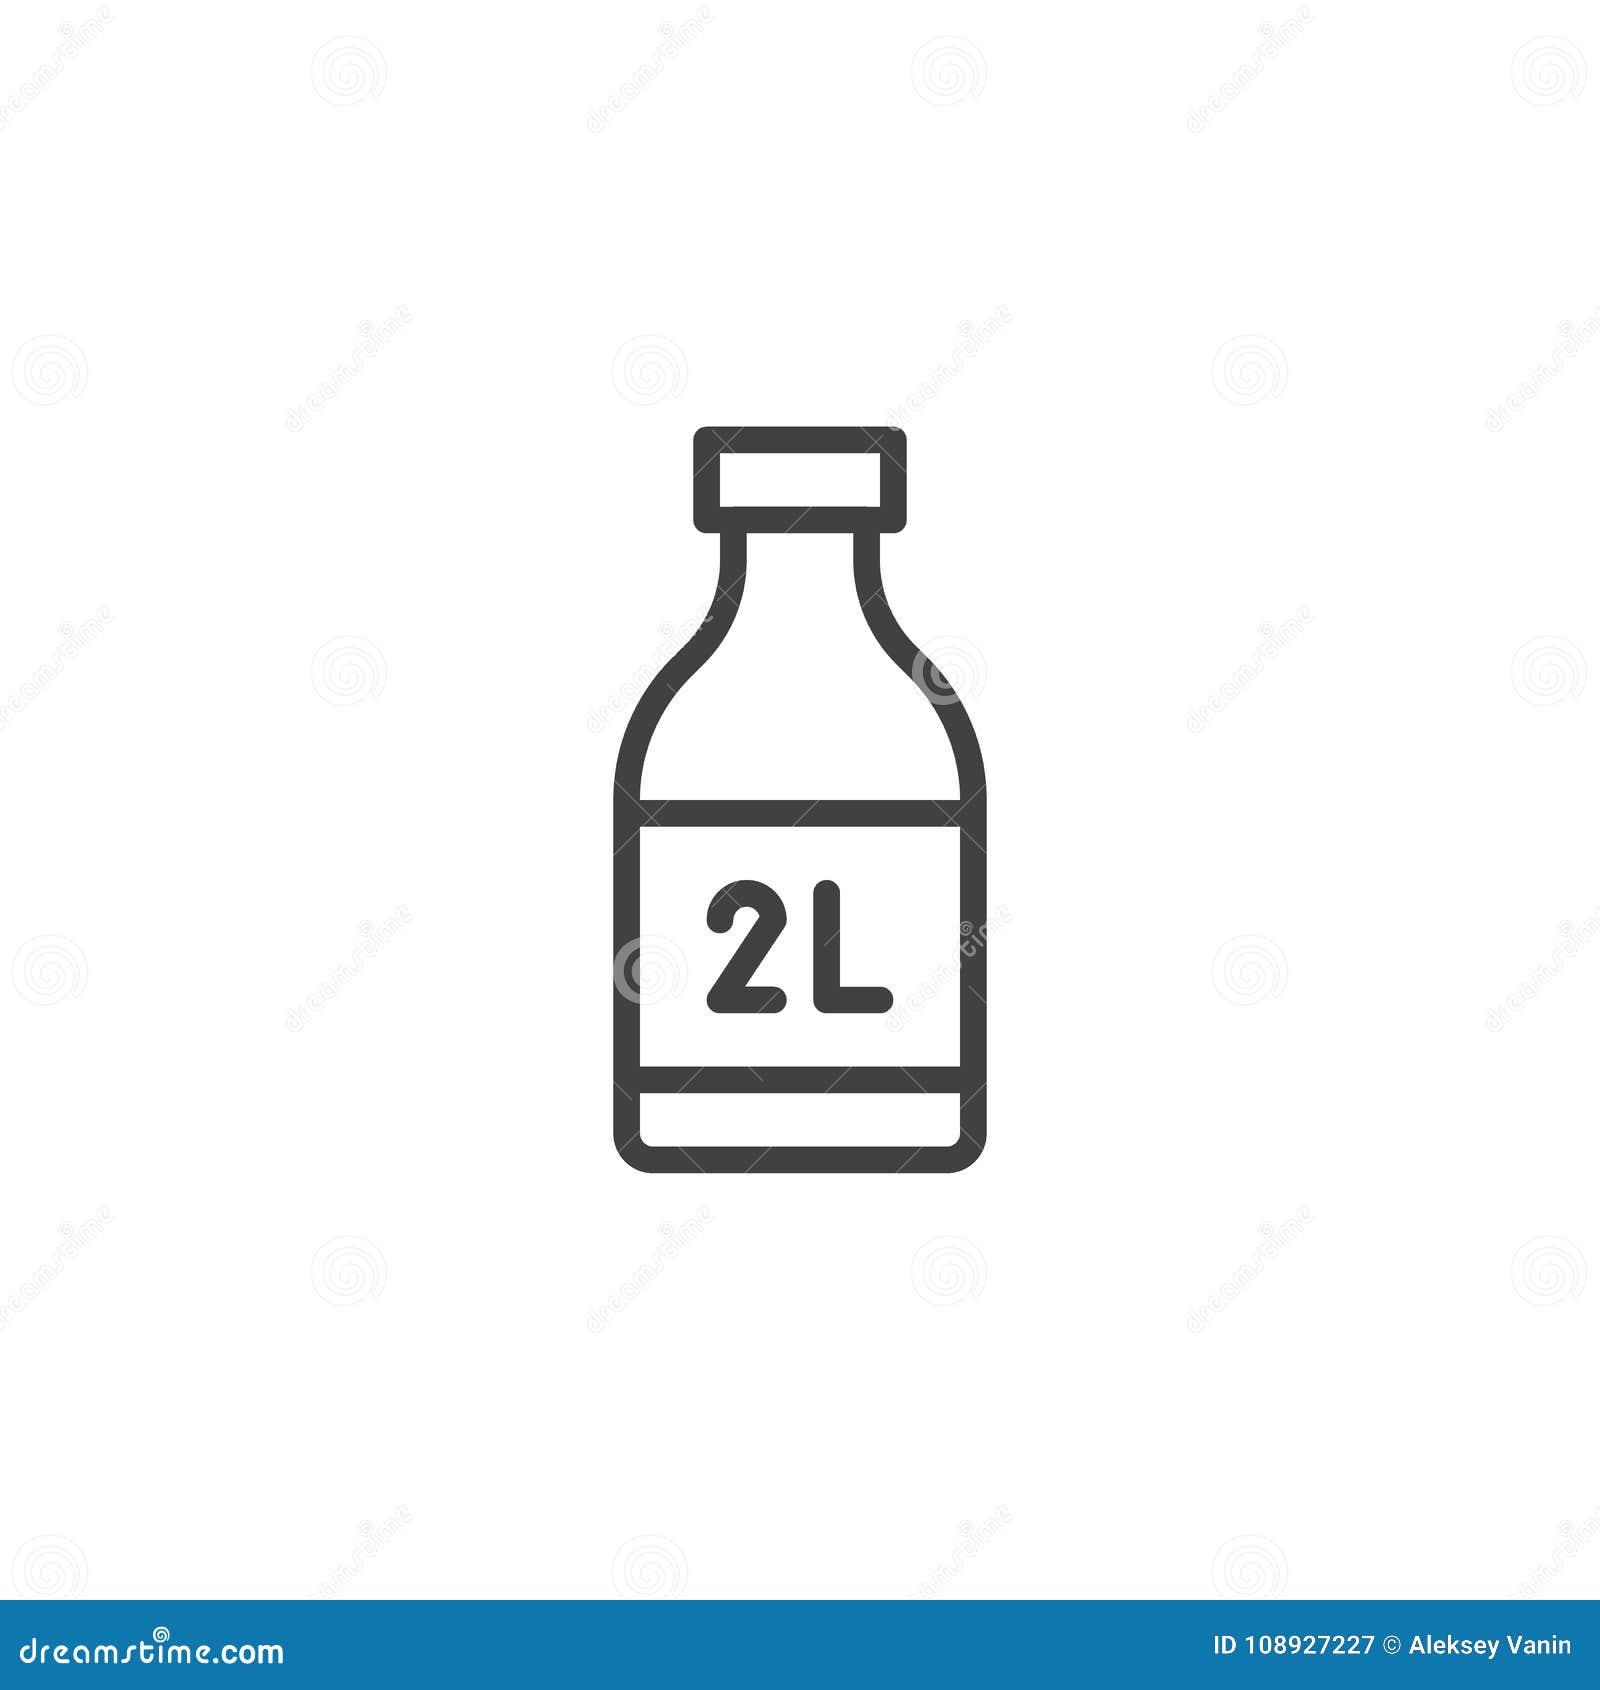 2 liter bottle line icon stock vector  Illustration of icon